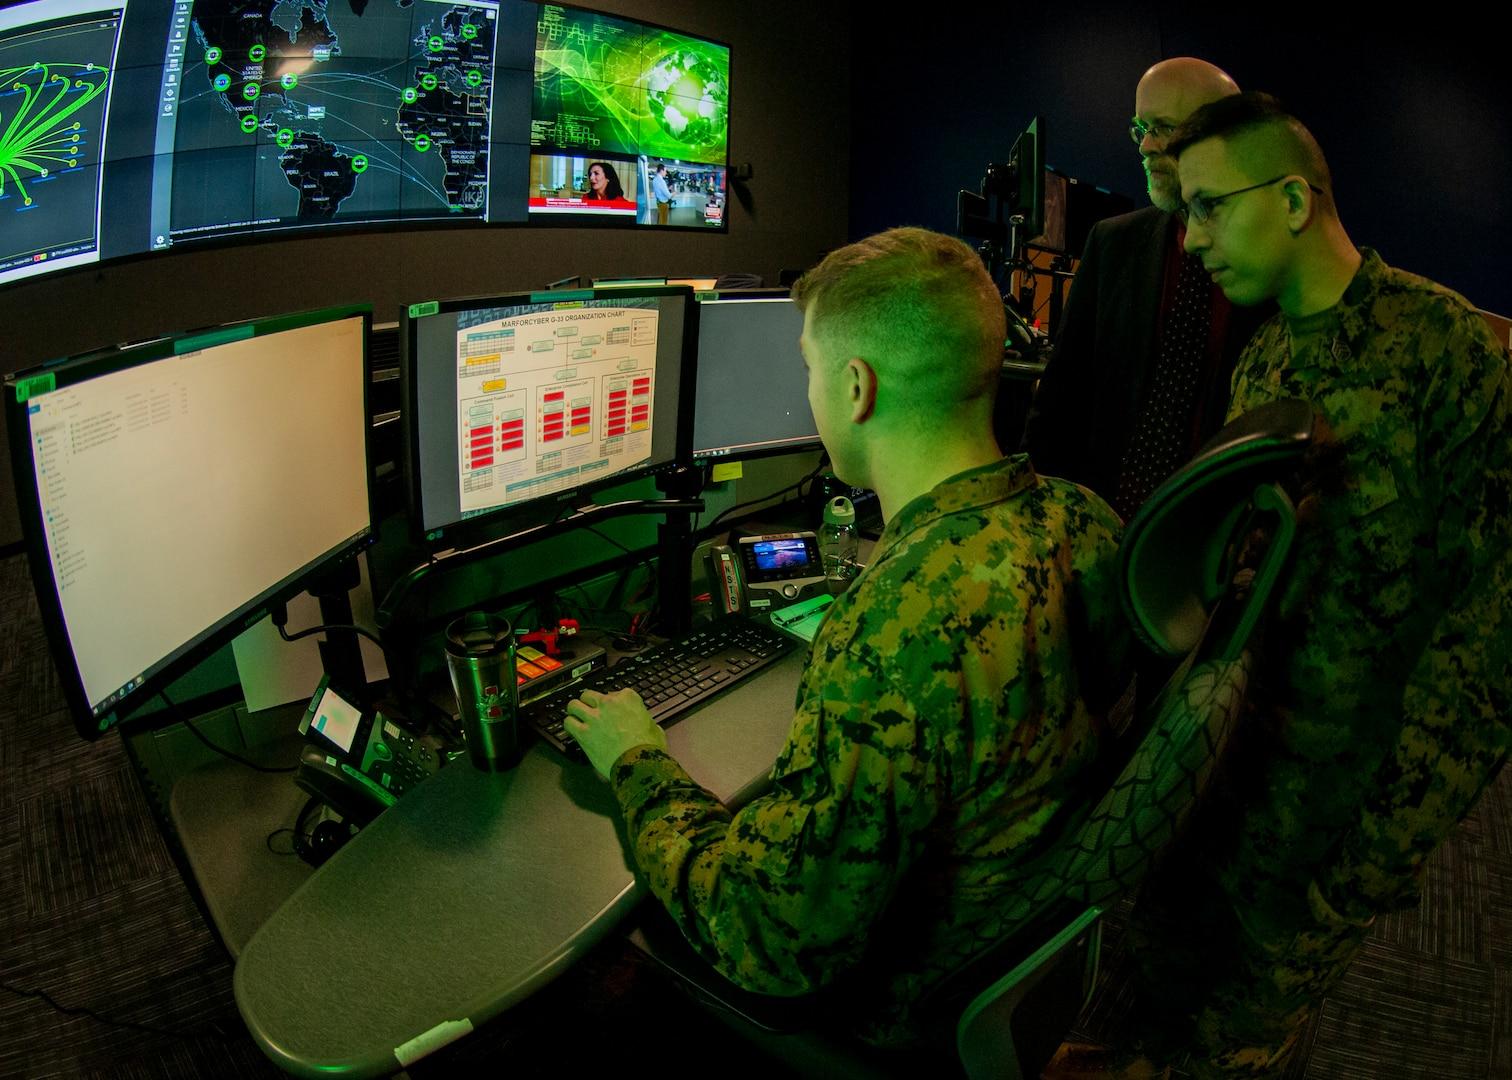 Service members looking at computer screen.